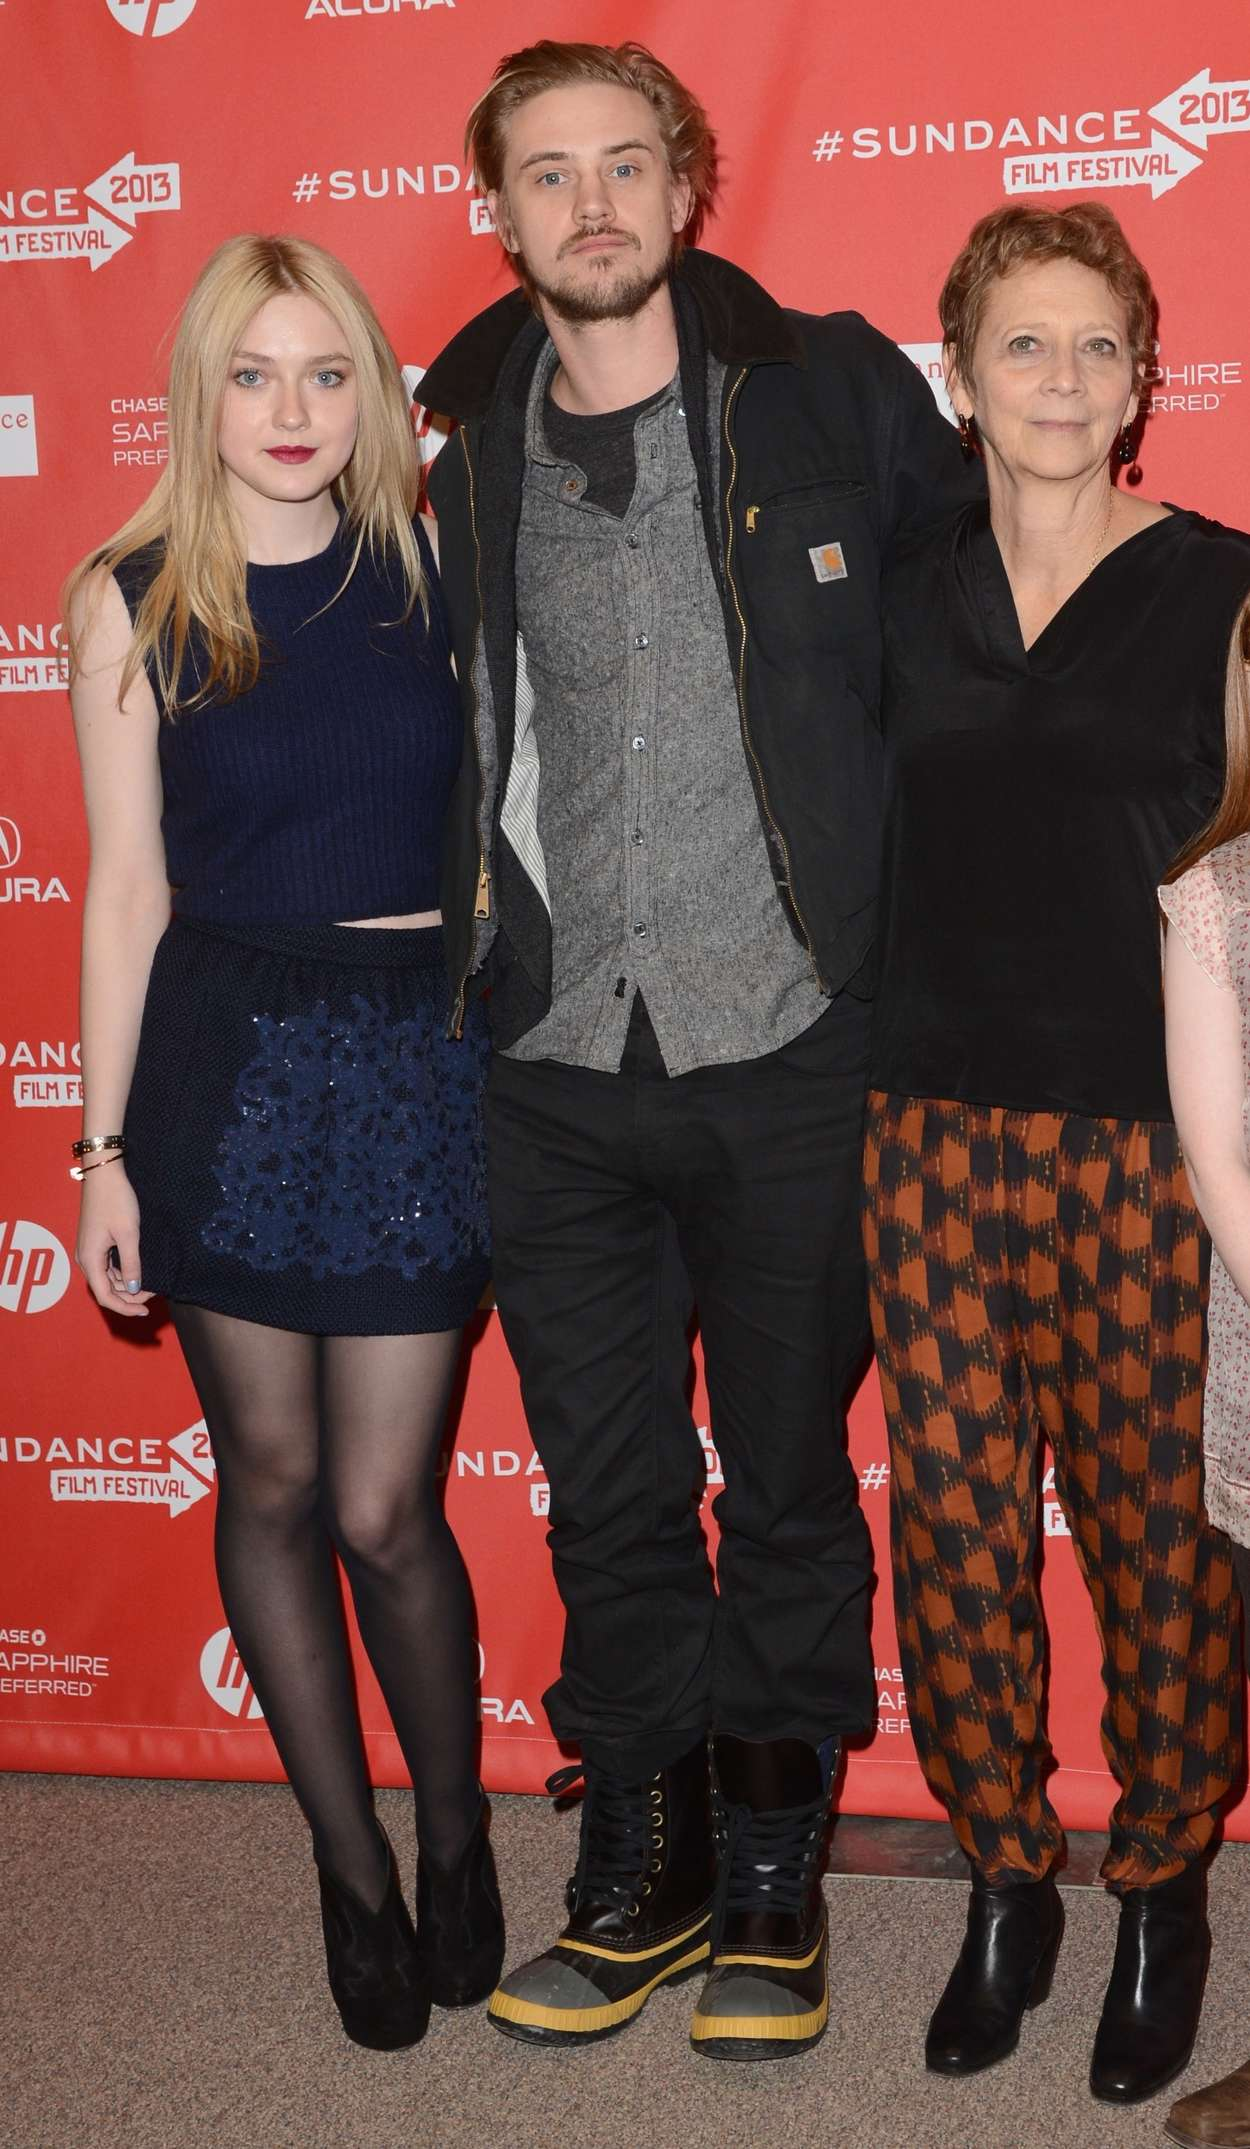 Dakota Fanning 2013 : Dakota Fanning at Sundance 2013-13